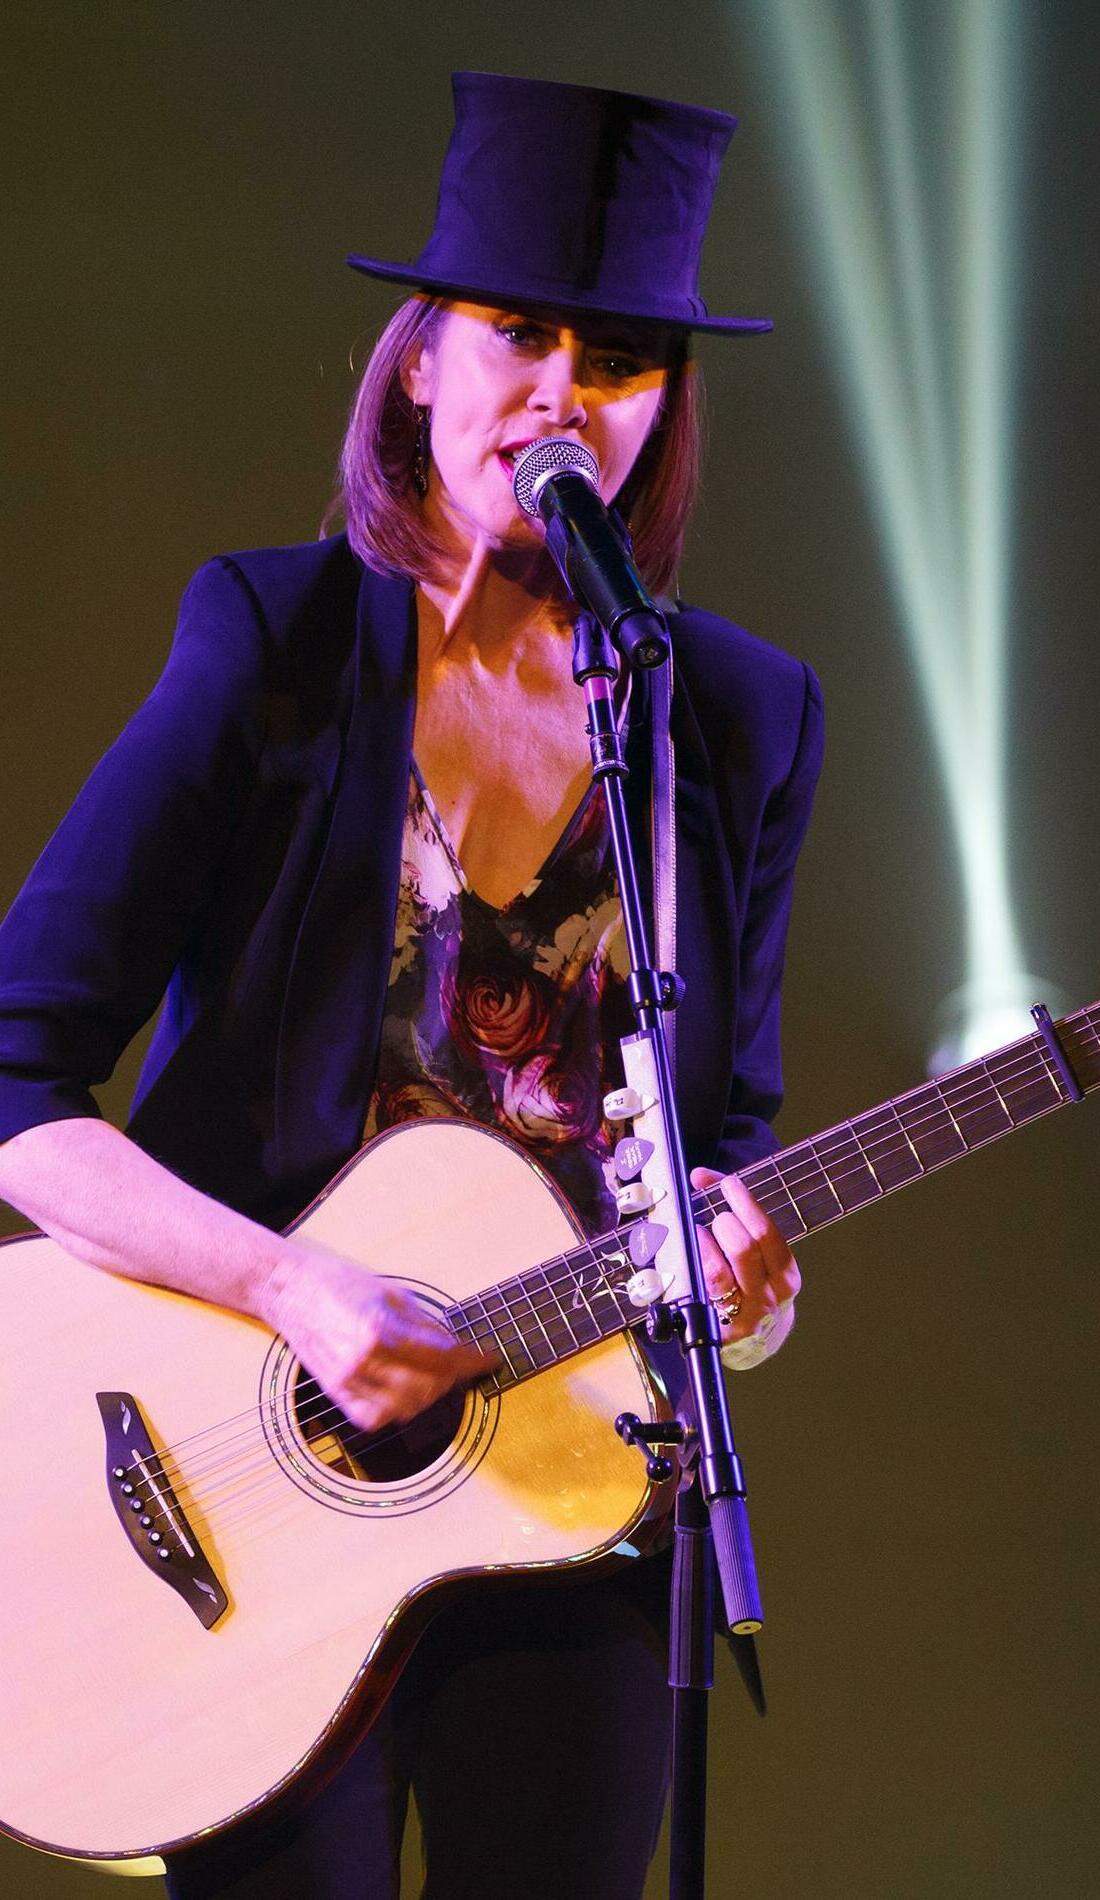 A Suzanne Vega live event